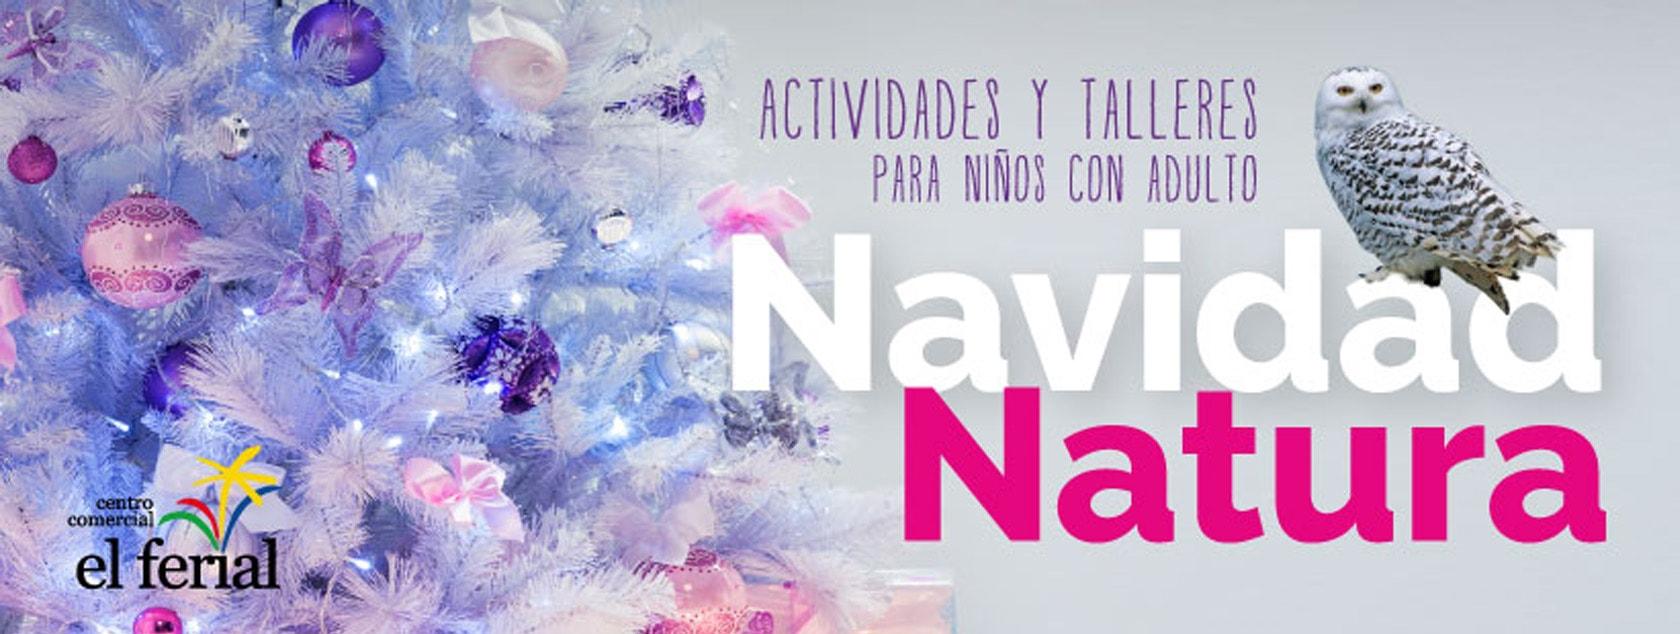 Actividades y Talleres. Navidad Natura 2016